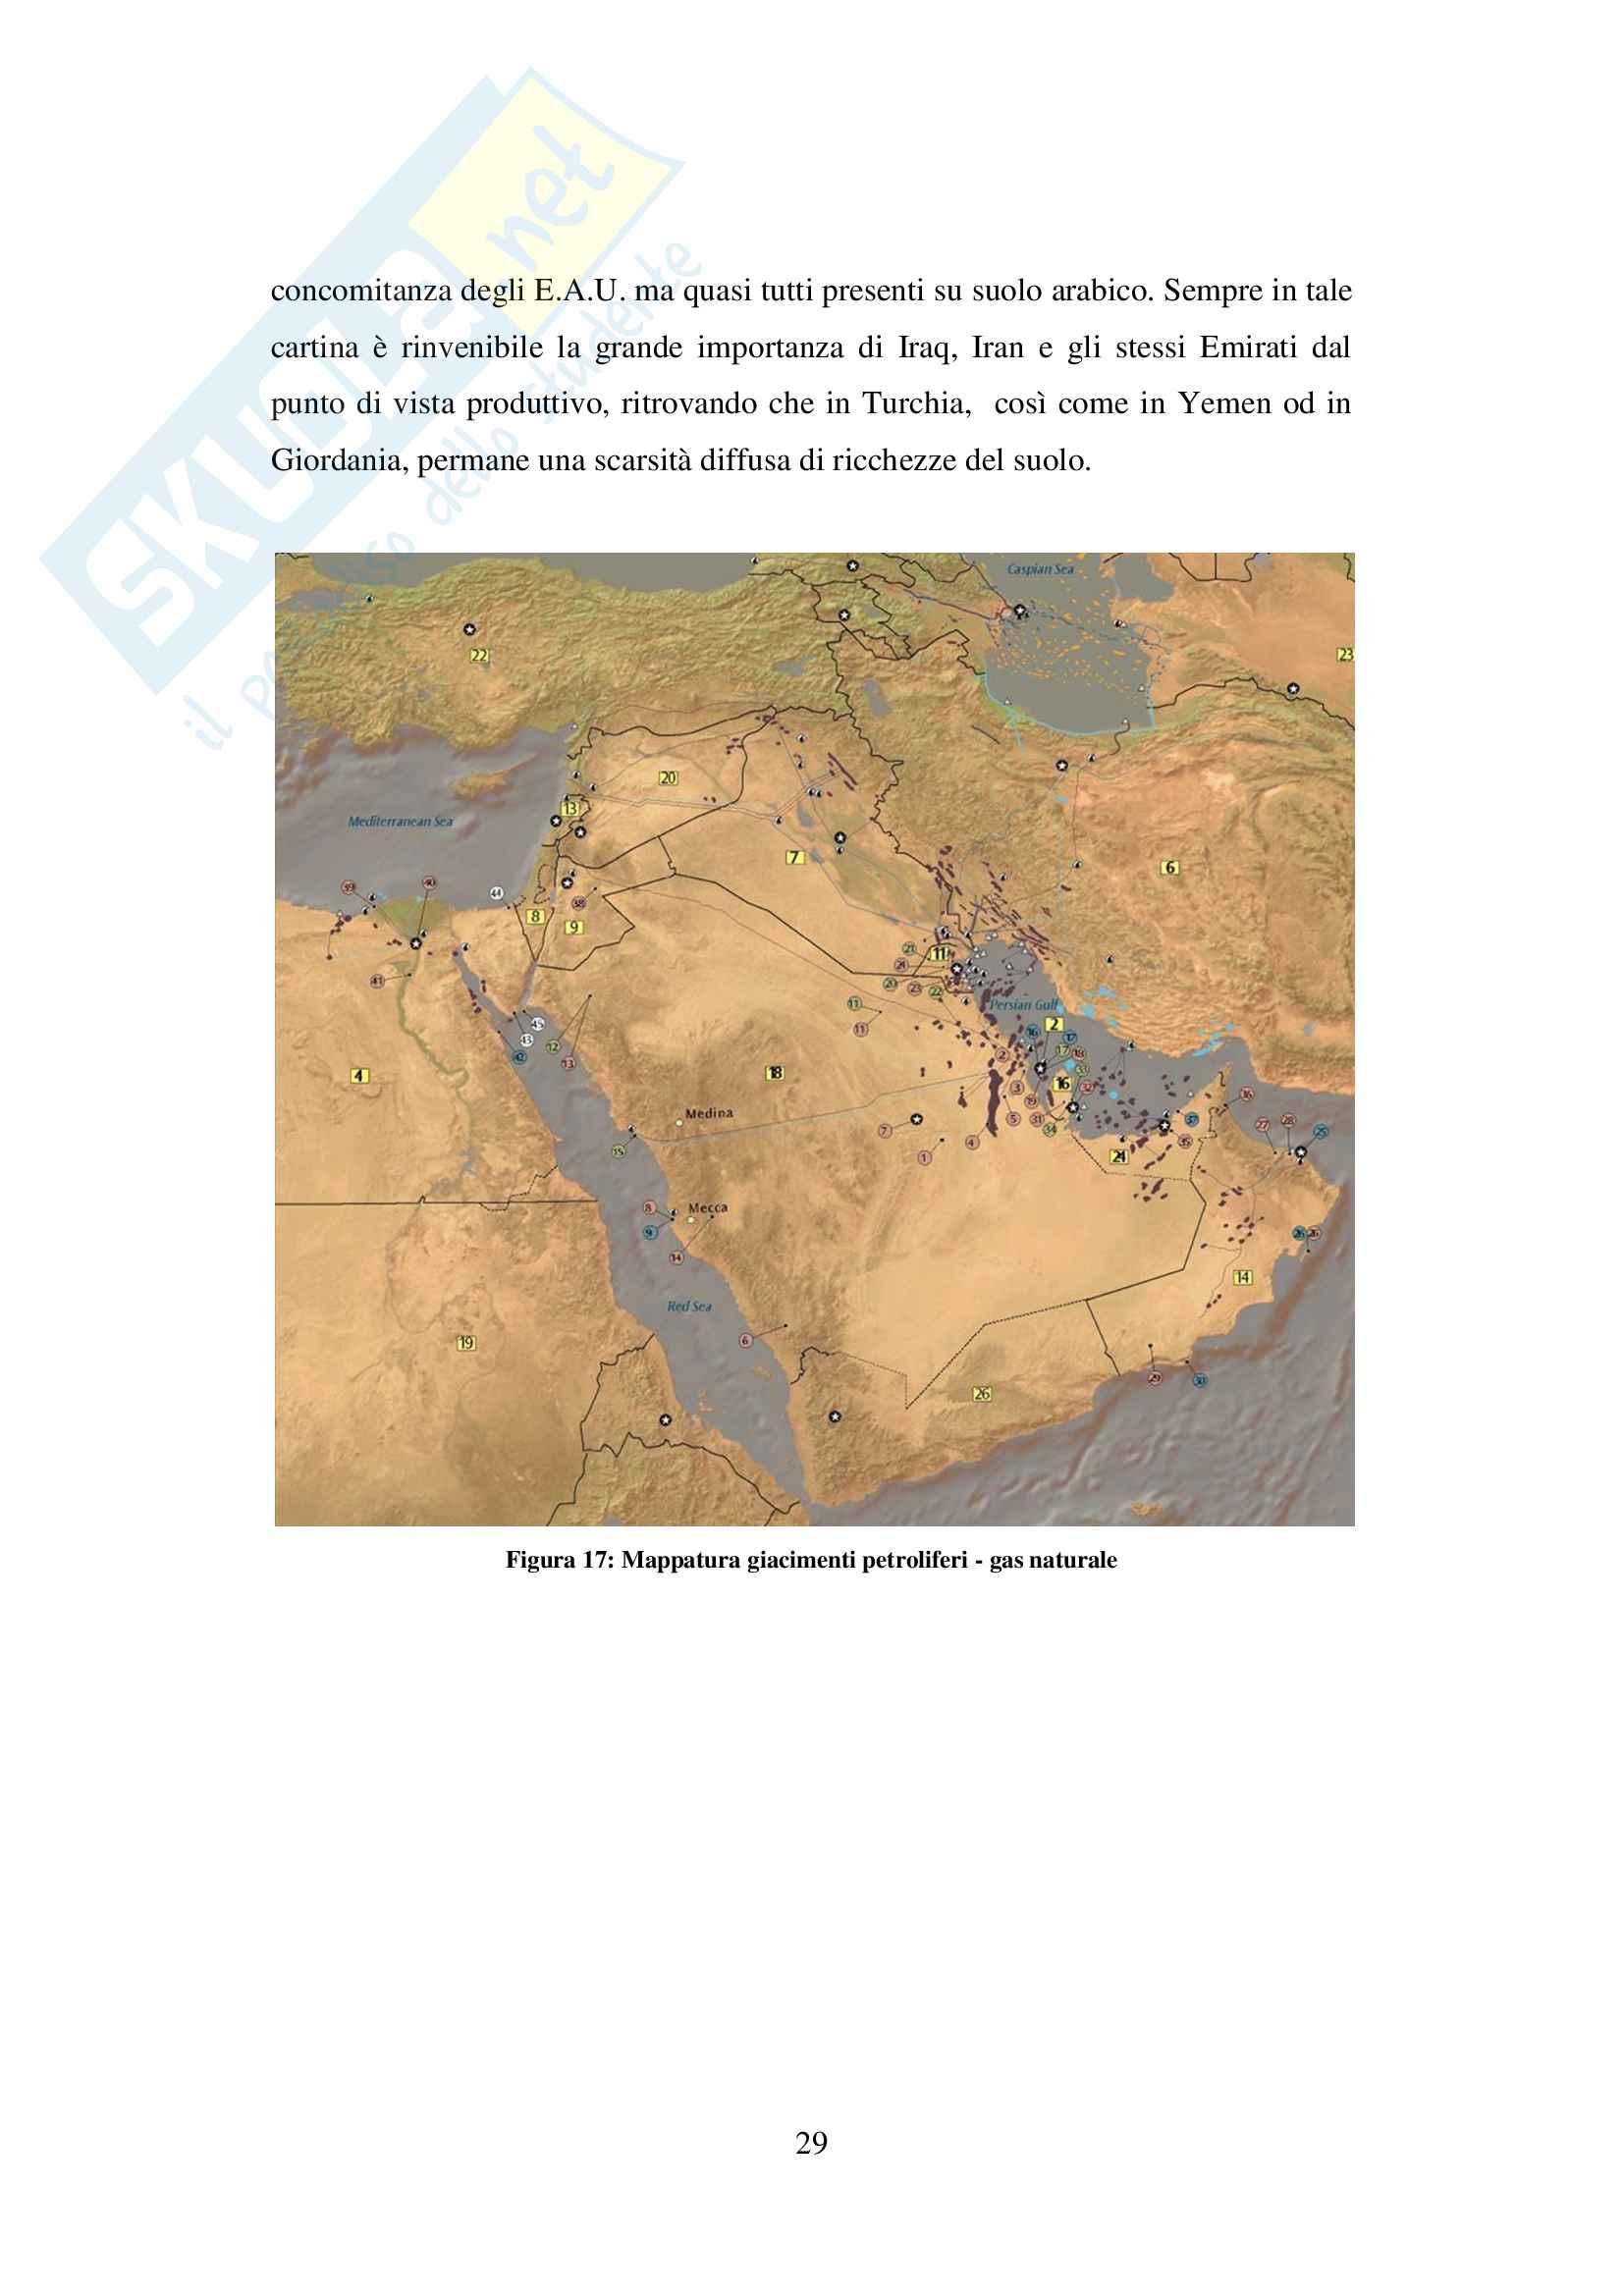 Tesi - Medio Oriente Nuova Frontiera delle Energie Rinnovabili Pag. 31